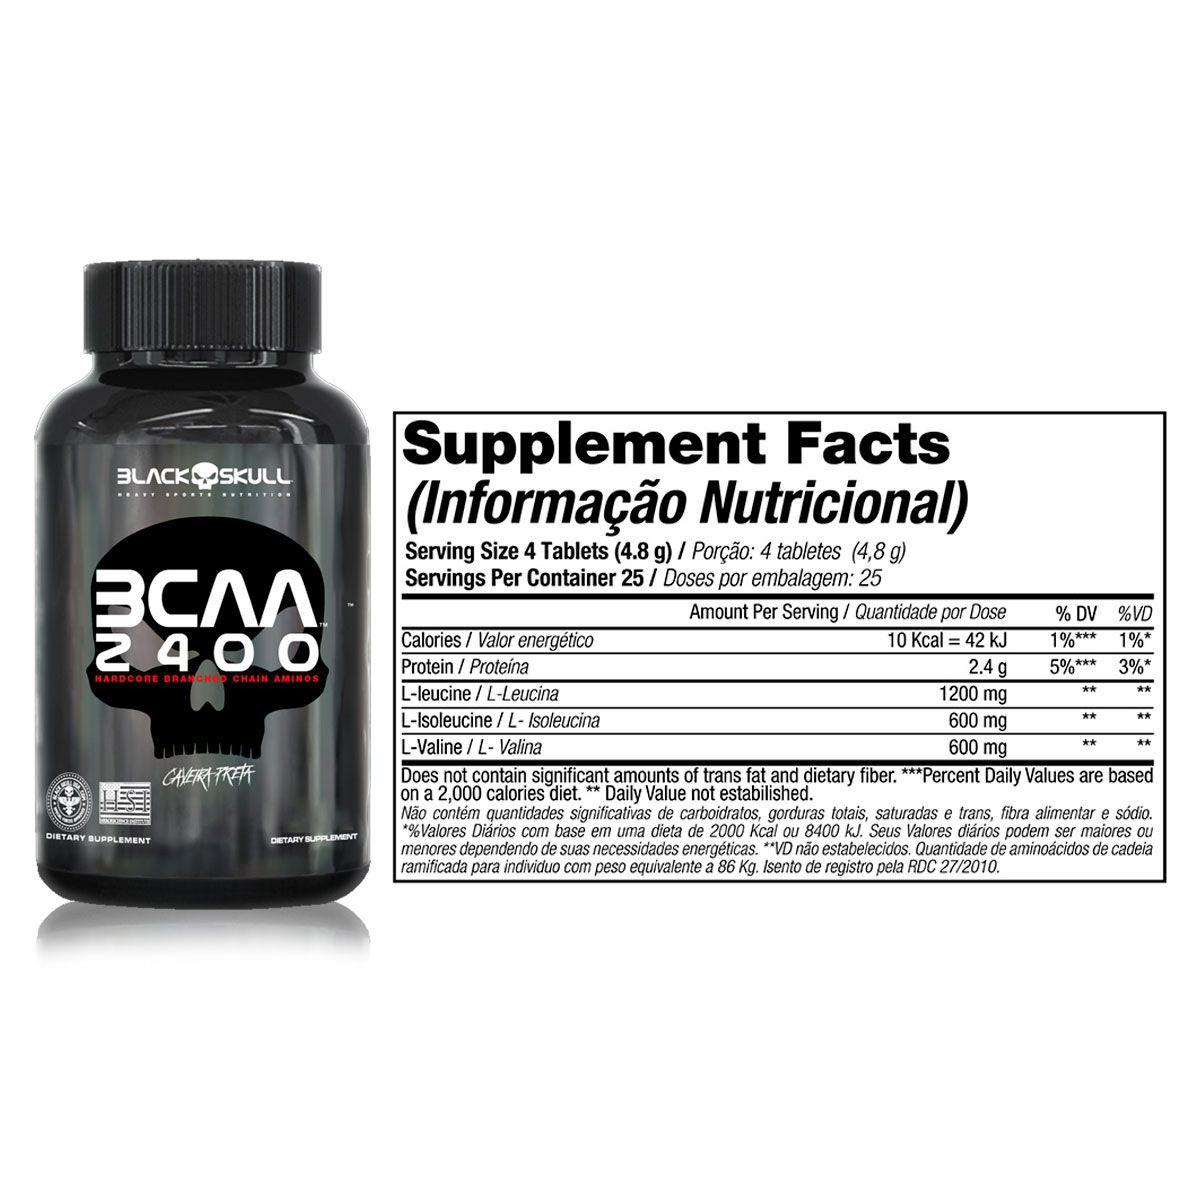 Kit Whey Protein 7 + BCAA 2400 30 Tabletes + Creatine 150g + Coqueteleira - Black Skull